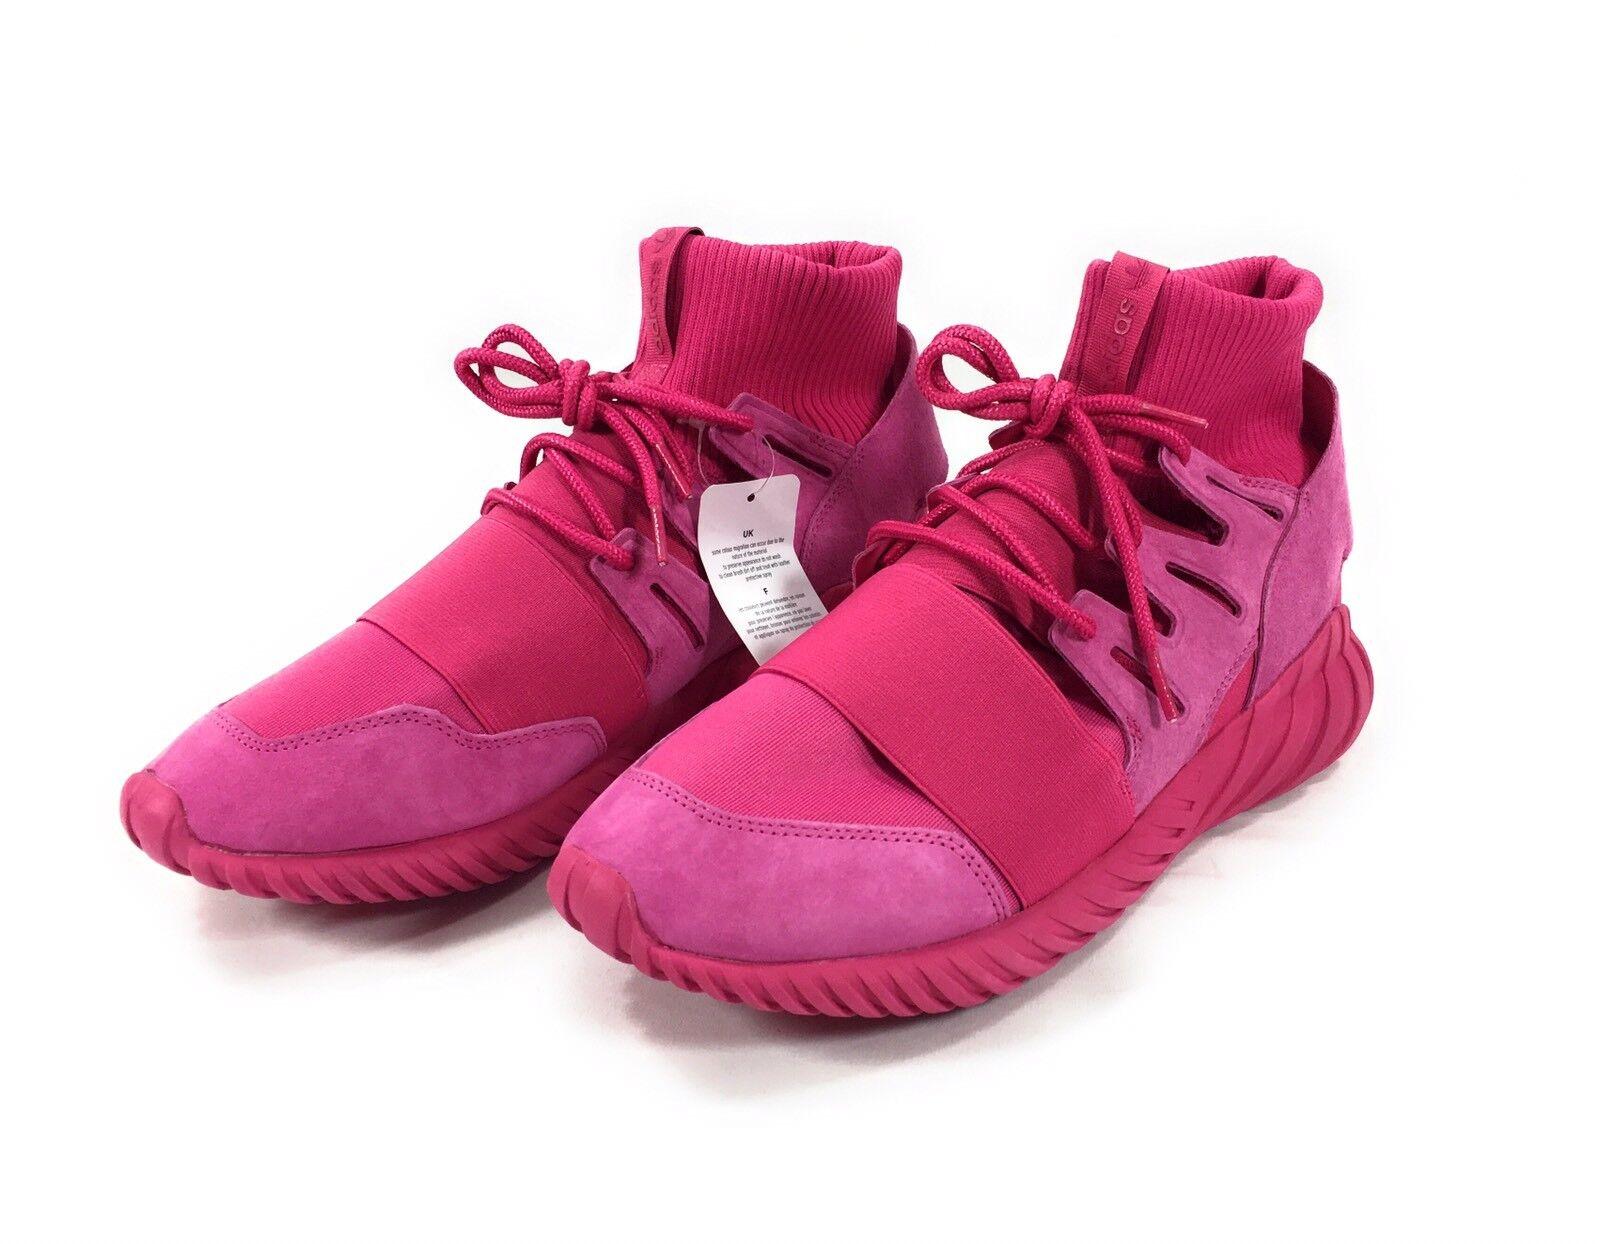 Adidas para hombre 10.5 Tubular Doom Runner Originals Zapatos color de punto todo color Zapatos de rosa gamuza S74795 afb83c